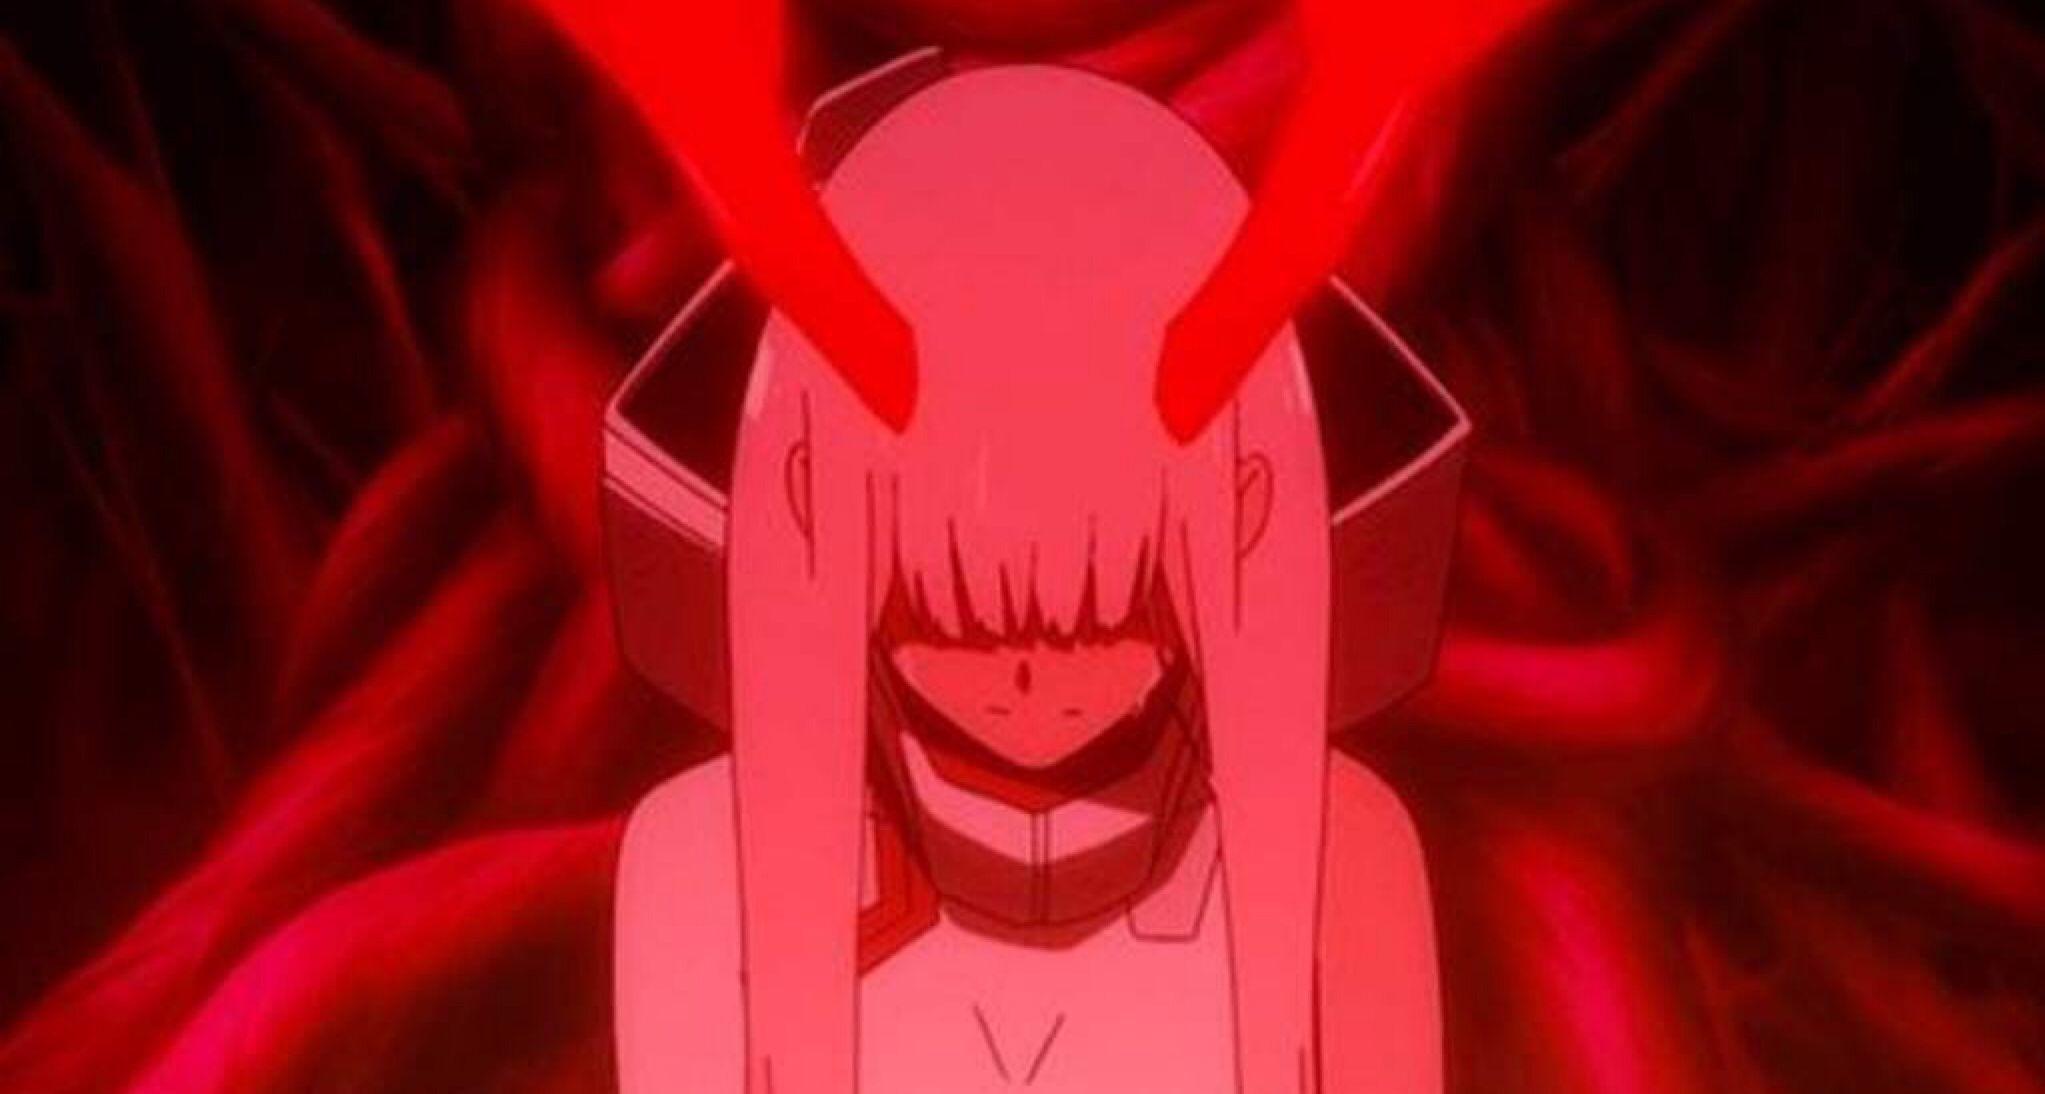 Pin By ƒѵӏӏҽղaղզҽӏ On Darling In The Franxx Darling In The Franxx Anime Anime Inspired